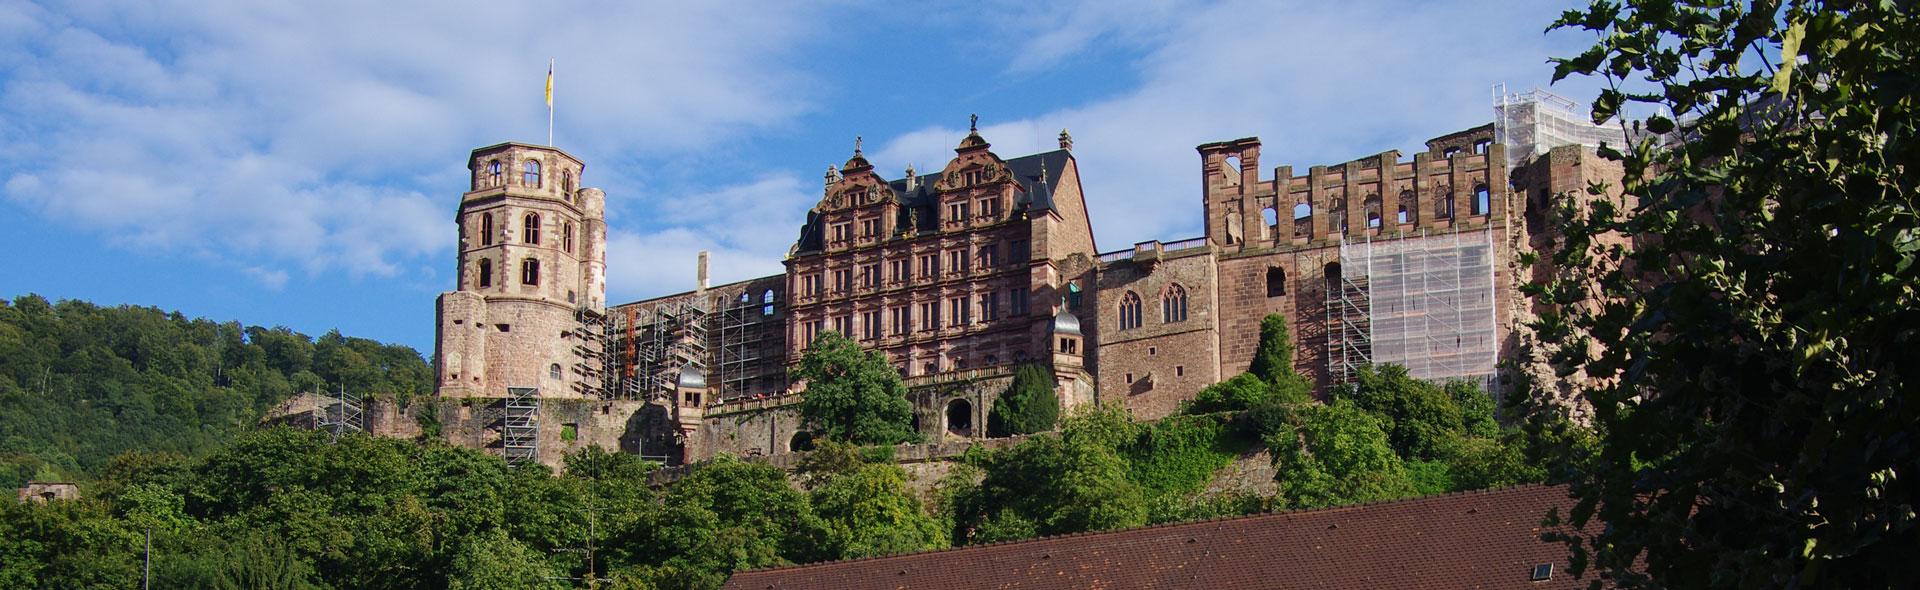 Heidelberg, Königin der Burgenstraße